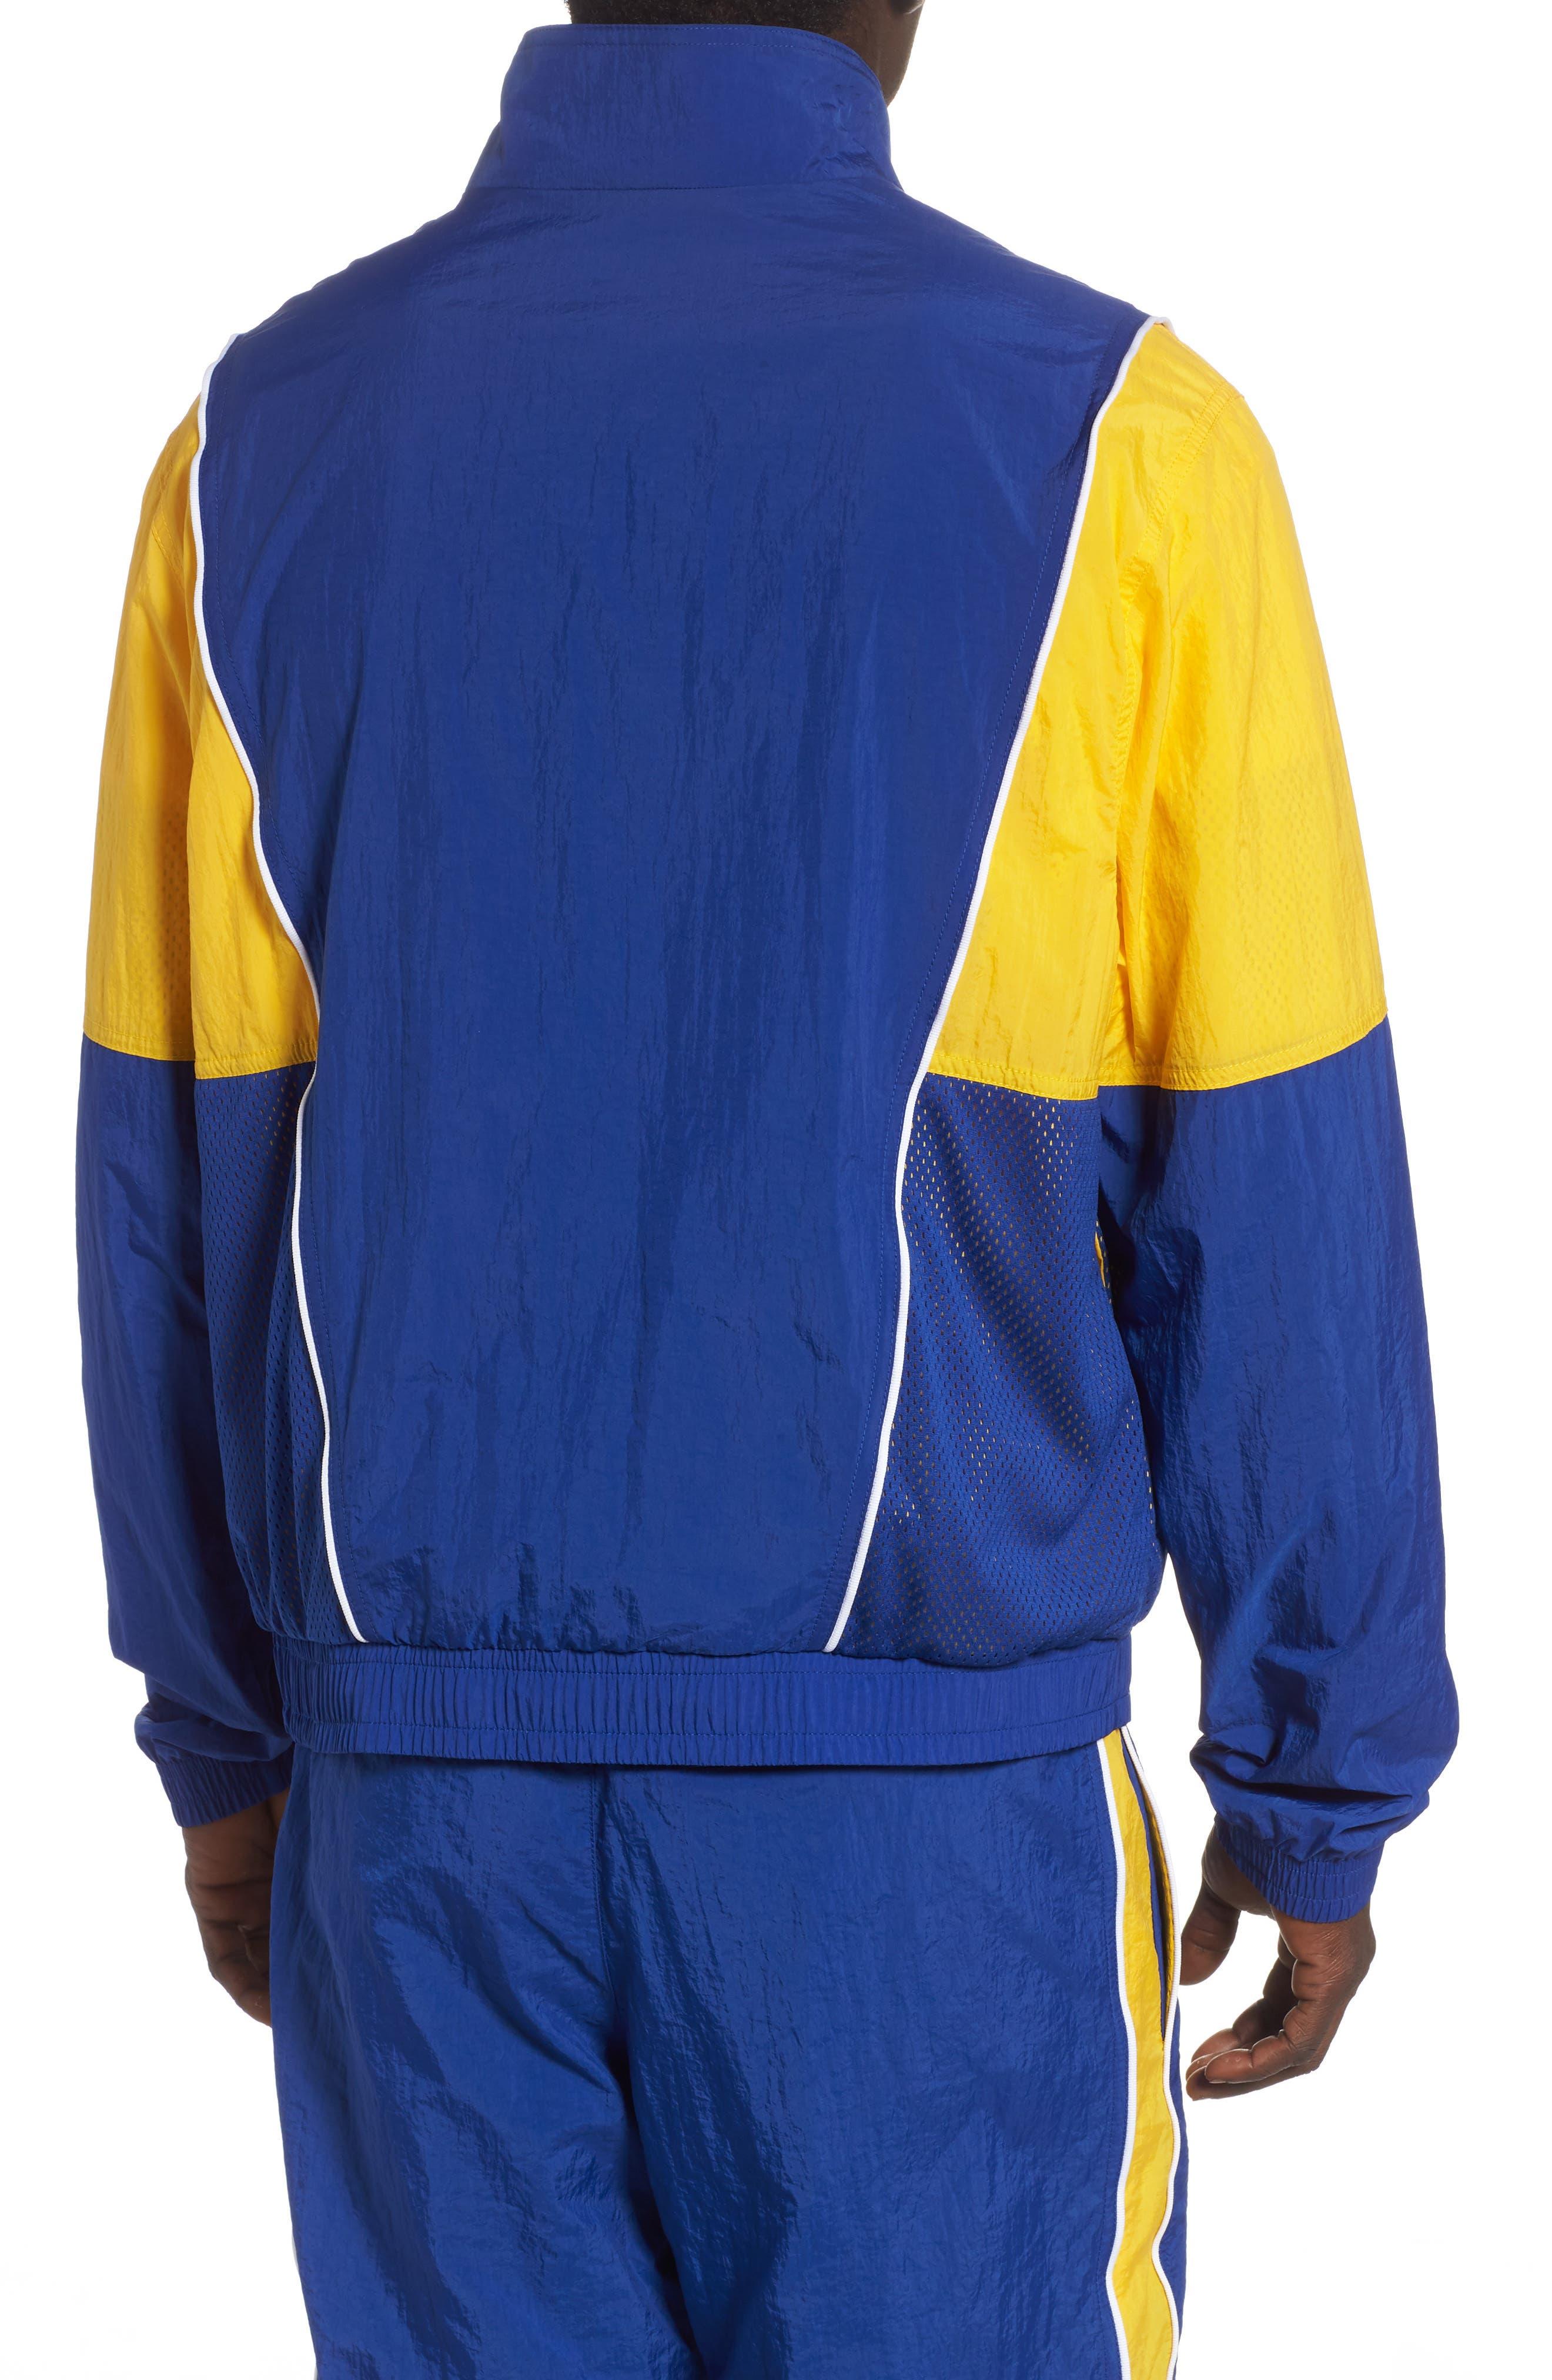 Golden State Warriors Track Jacket,                             Alternate thumbnail 2, color,                             RUSH BLUE/ AMARILLO/ WHITE